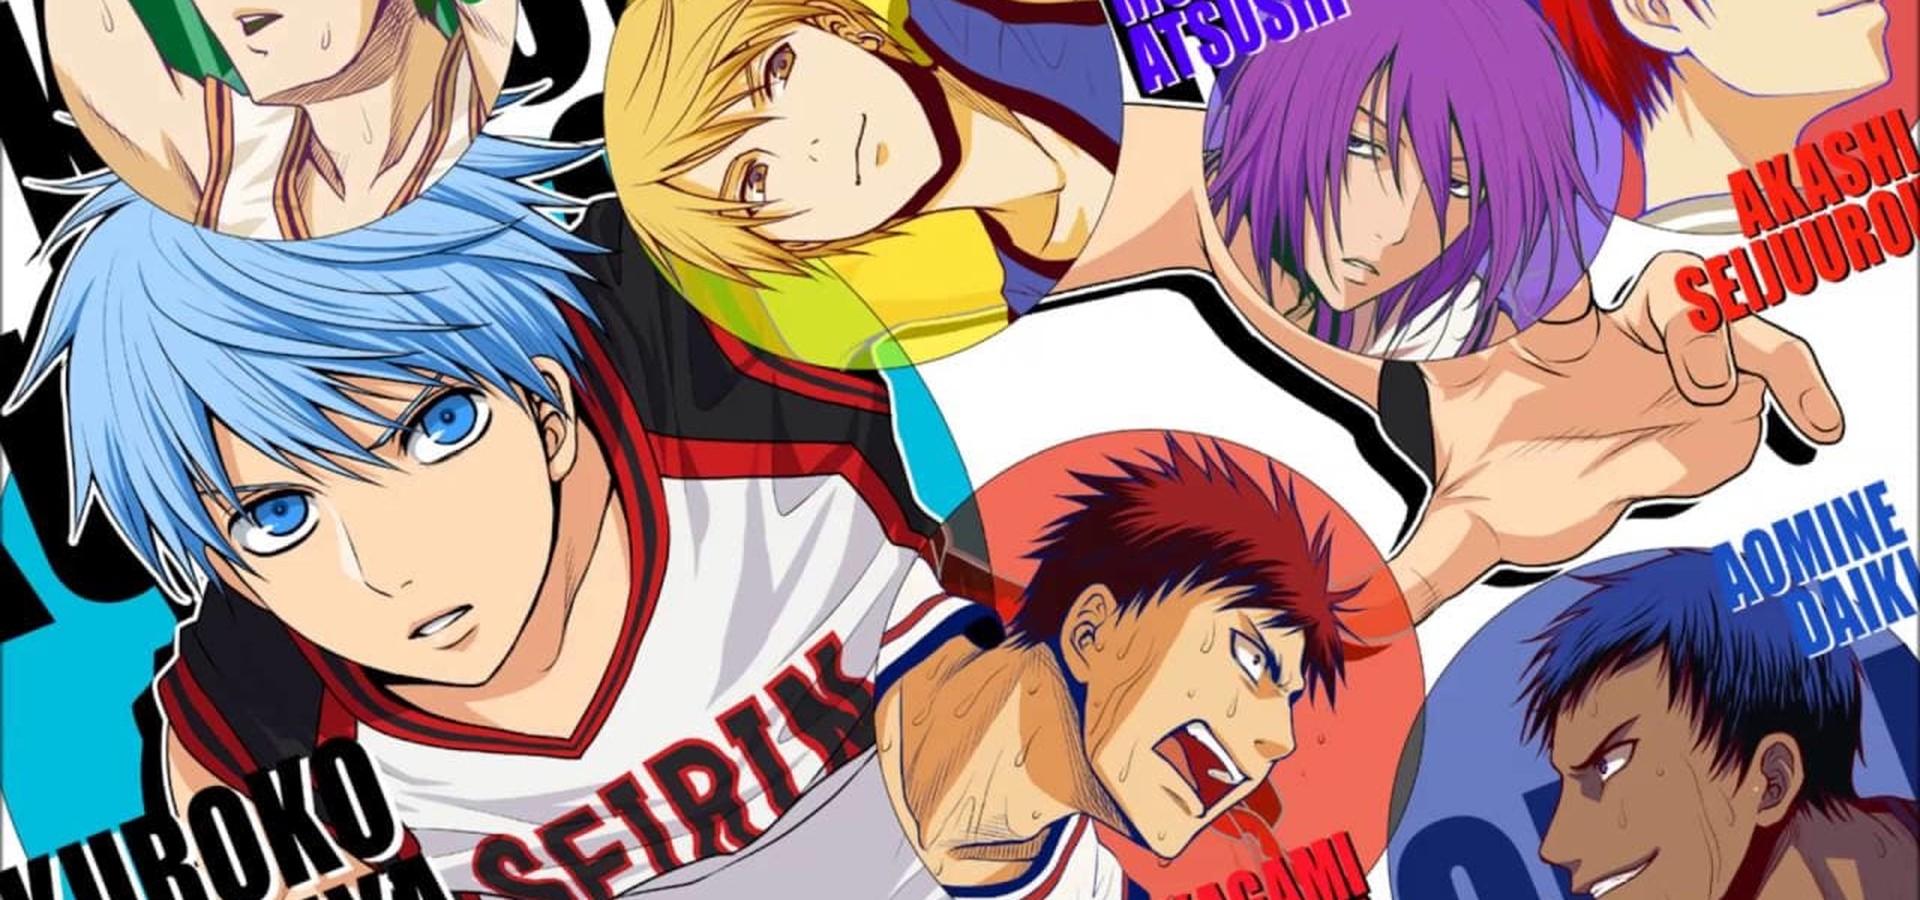 Kuroko's Basketball Season 2 All Episodes View Online Release Date Spoilers Cast & Crew